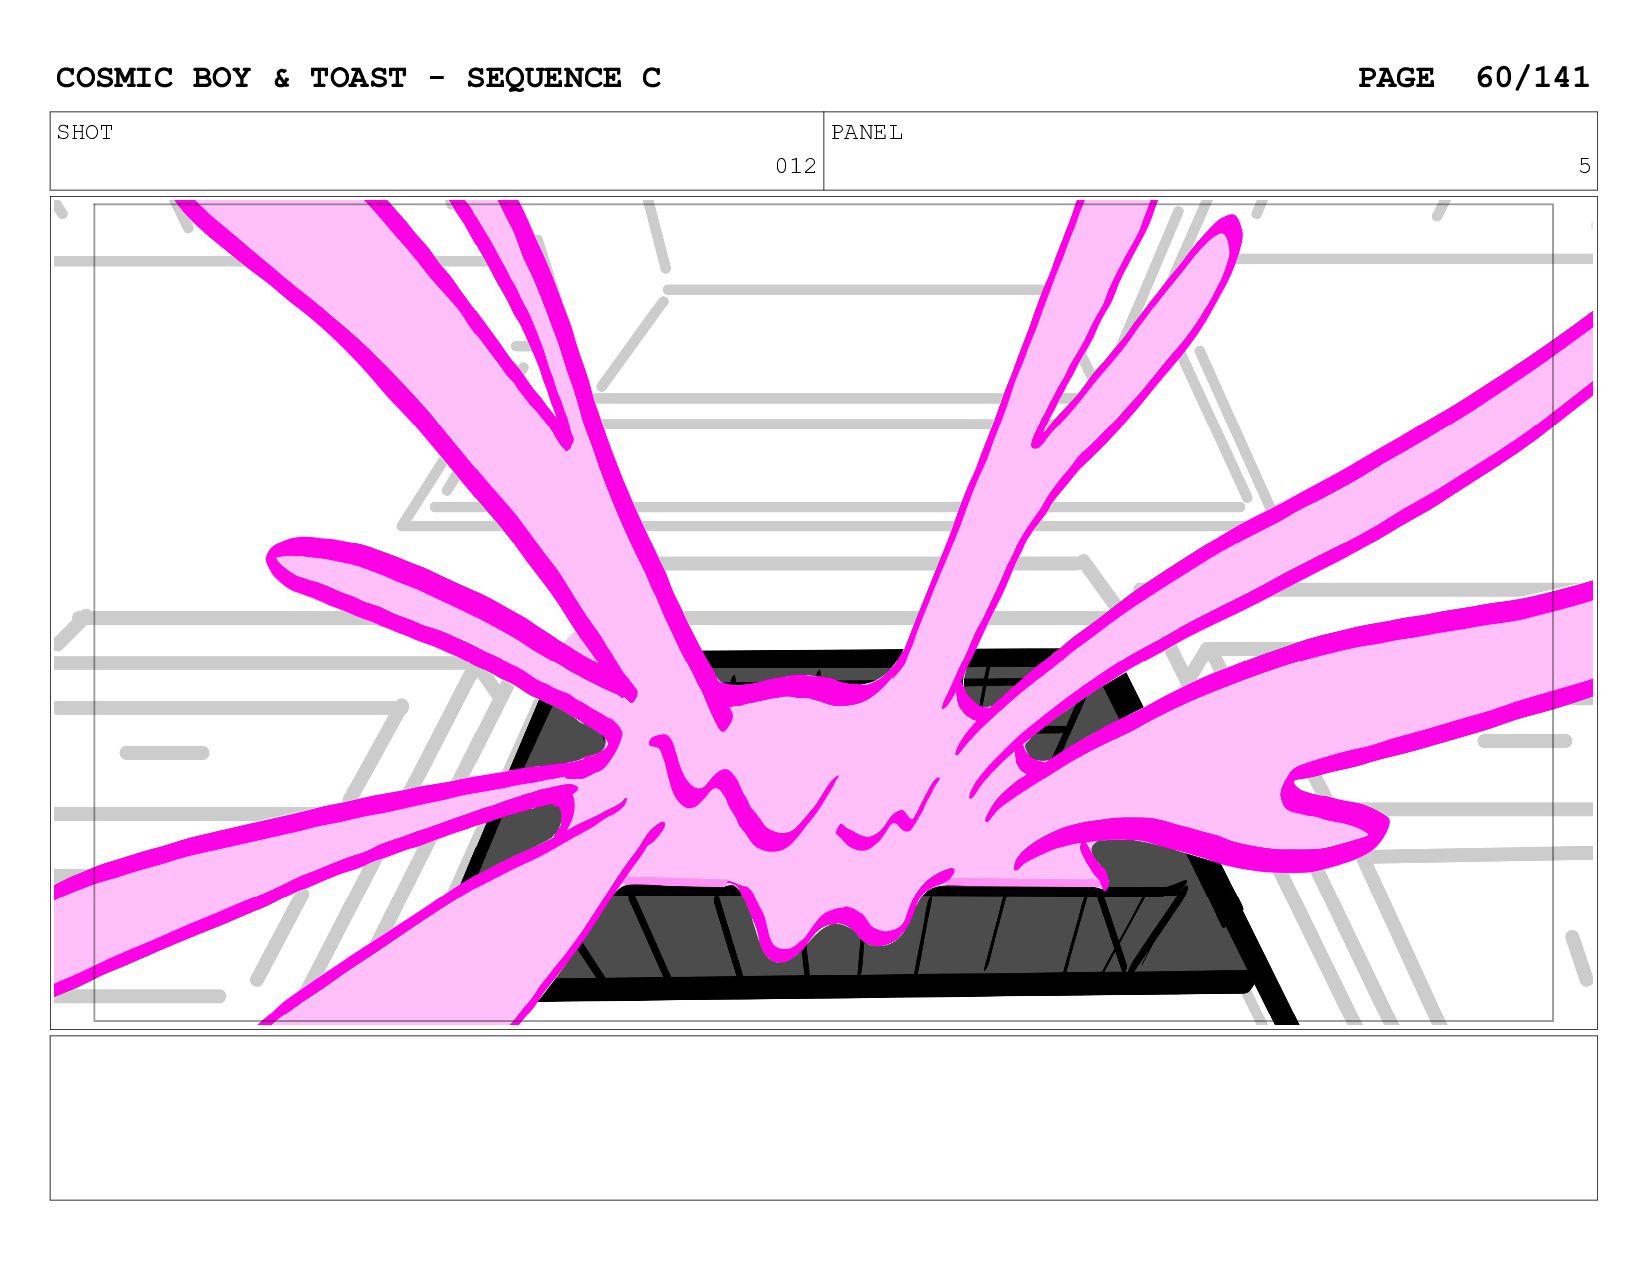 SCENE 012 PANEL E COSMIC BOY & TOAST - SEQUENCE...